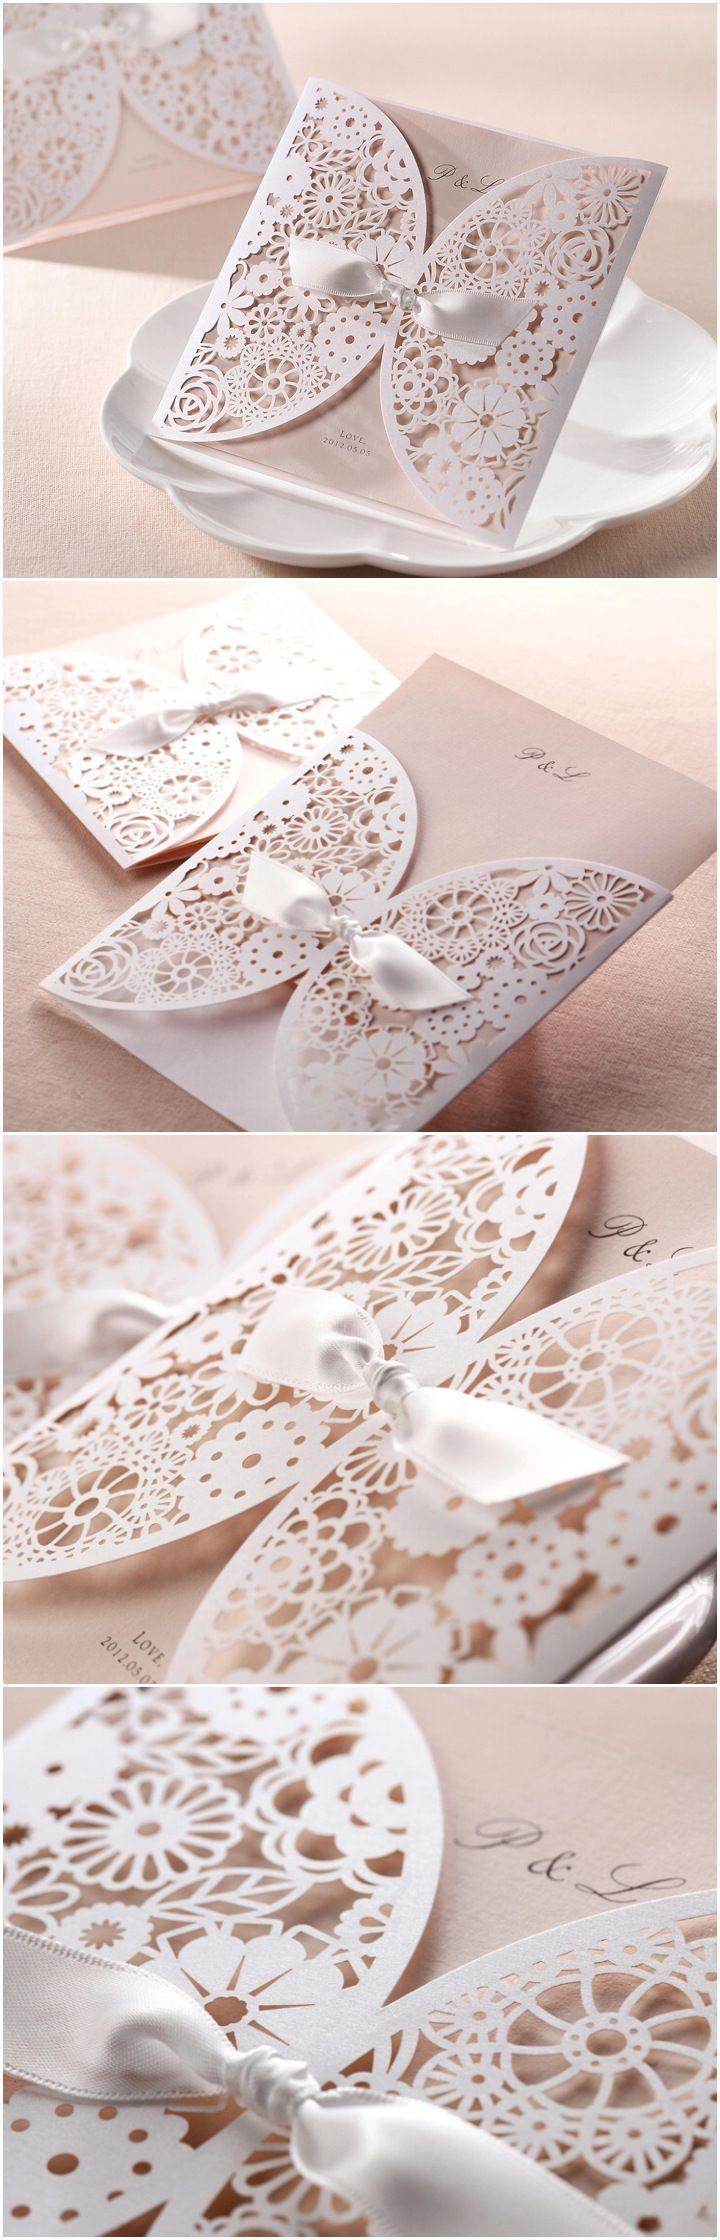 2015 Trending Elegant Laser Cut Wedding Invitations